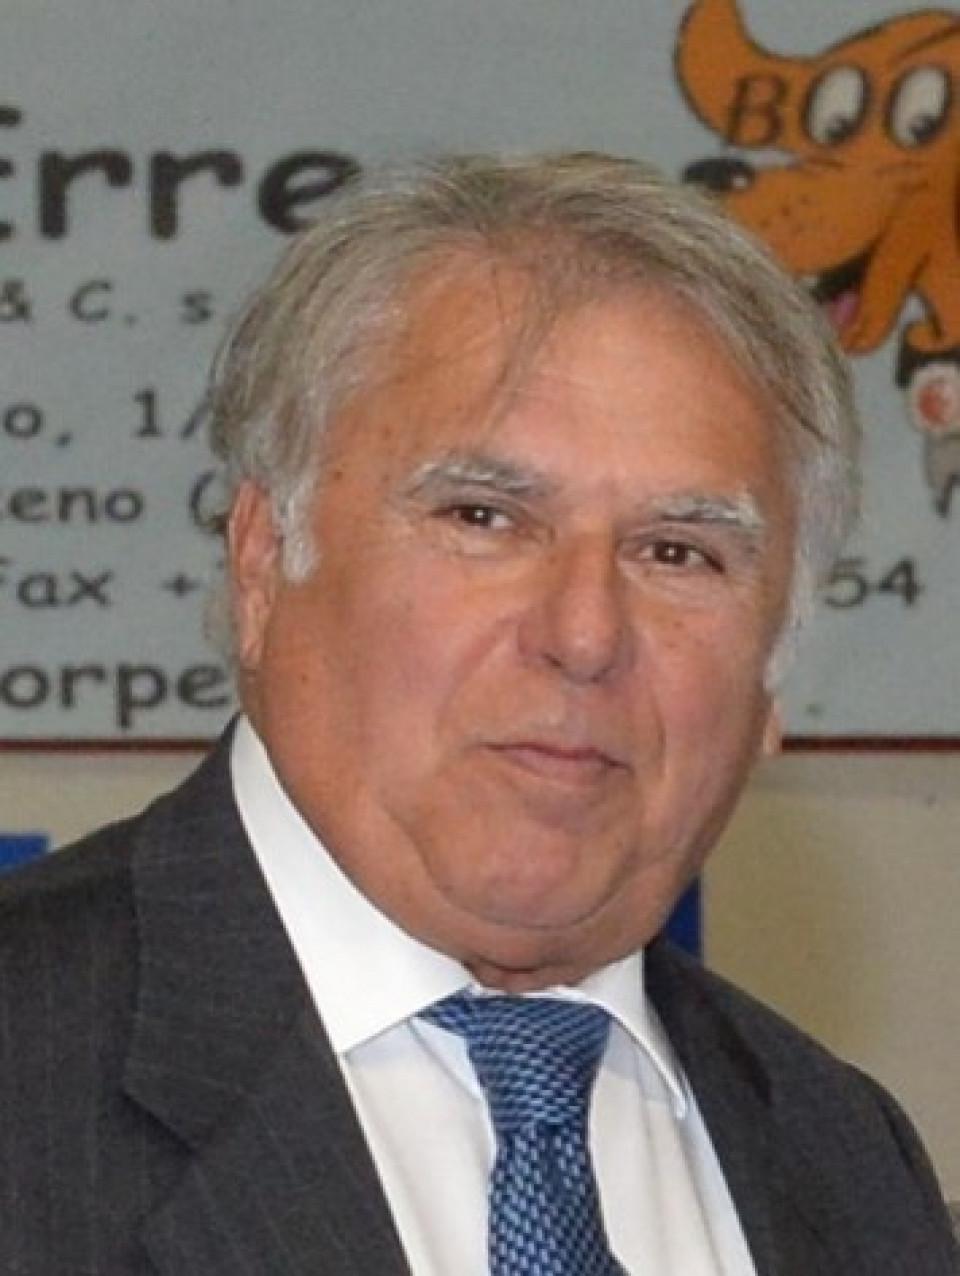 Giuseppe Bonfiglioli, Presidente dell'UP dal 2015